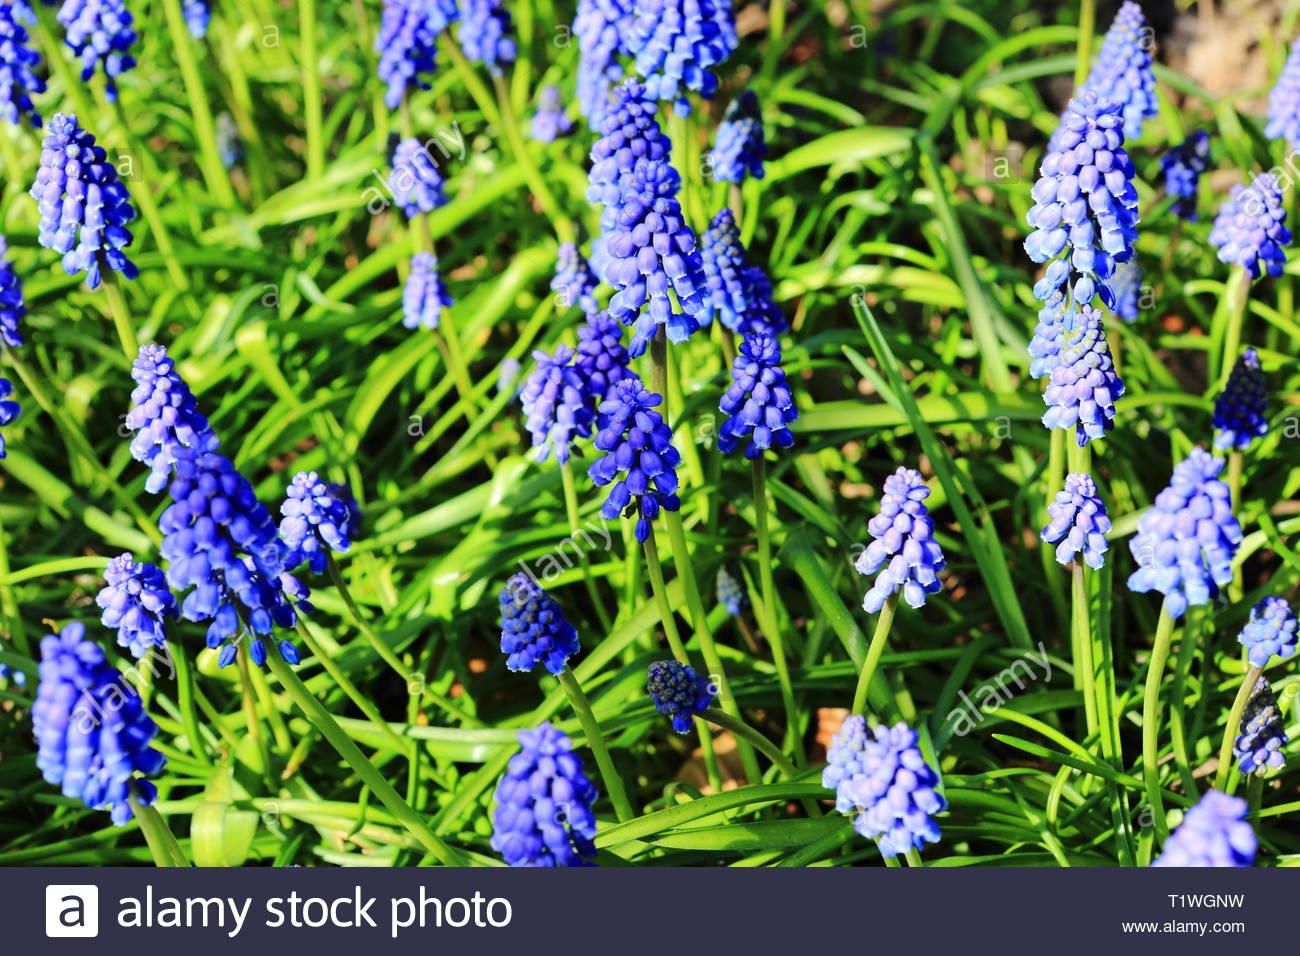 Muscari Traubenhyazinthen Asparagaceae Pflanzen am Anfang des Frühlings, März 2019 Stockbild